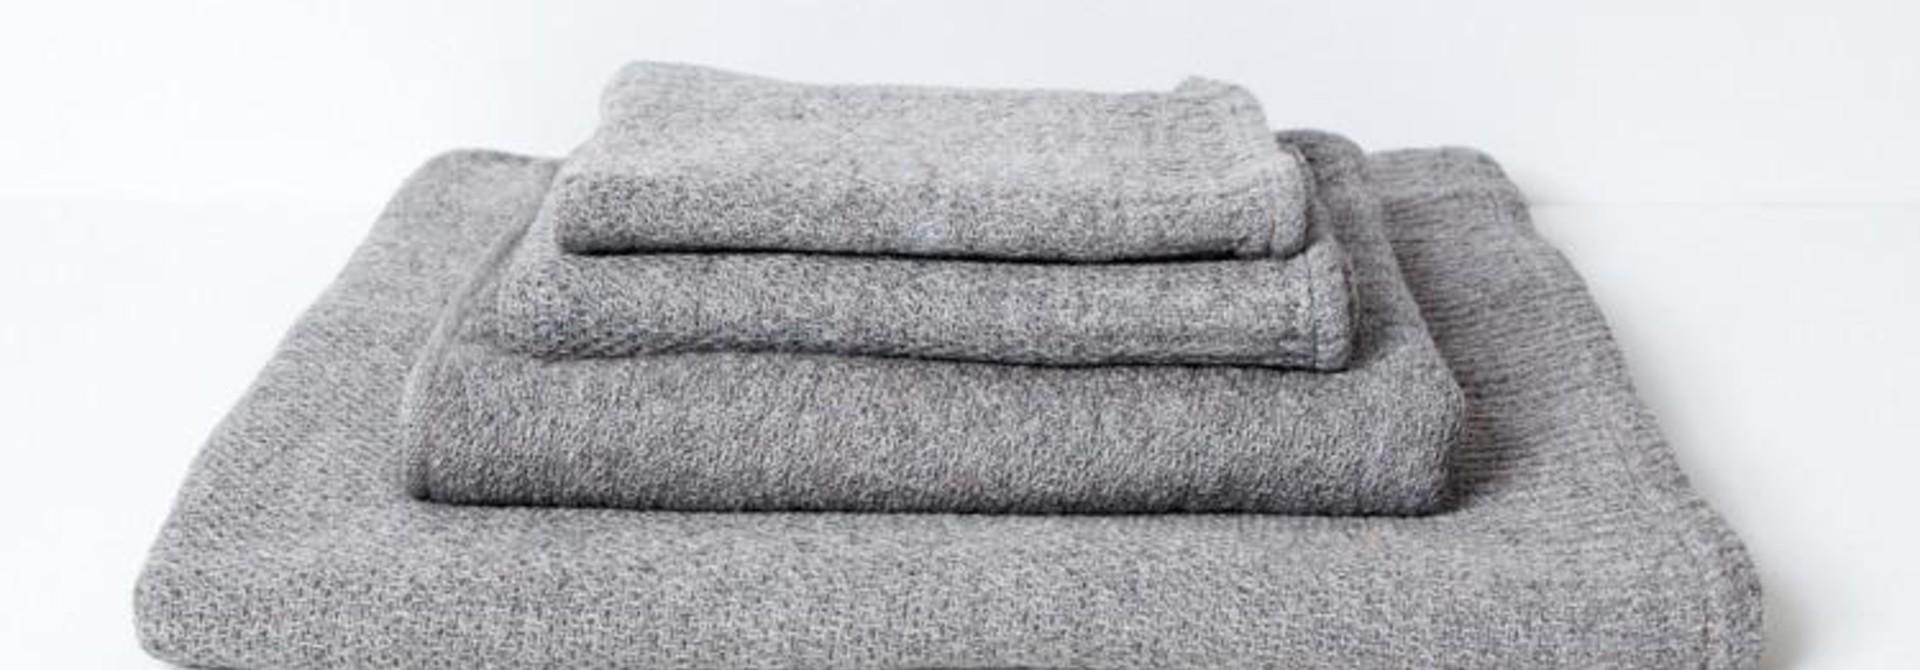 Bath Towel XL - Lana - Grey